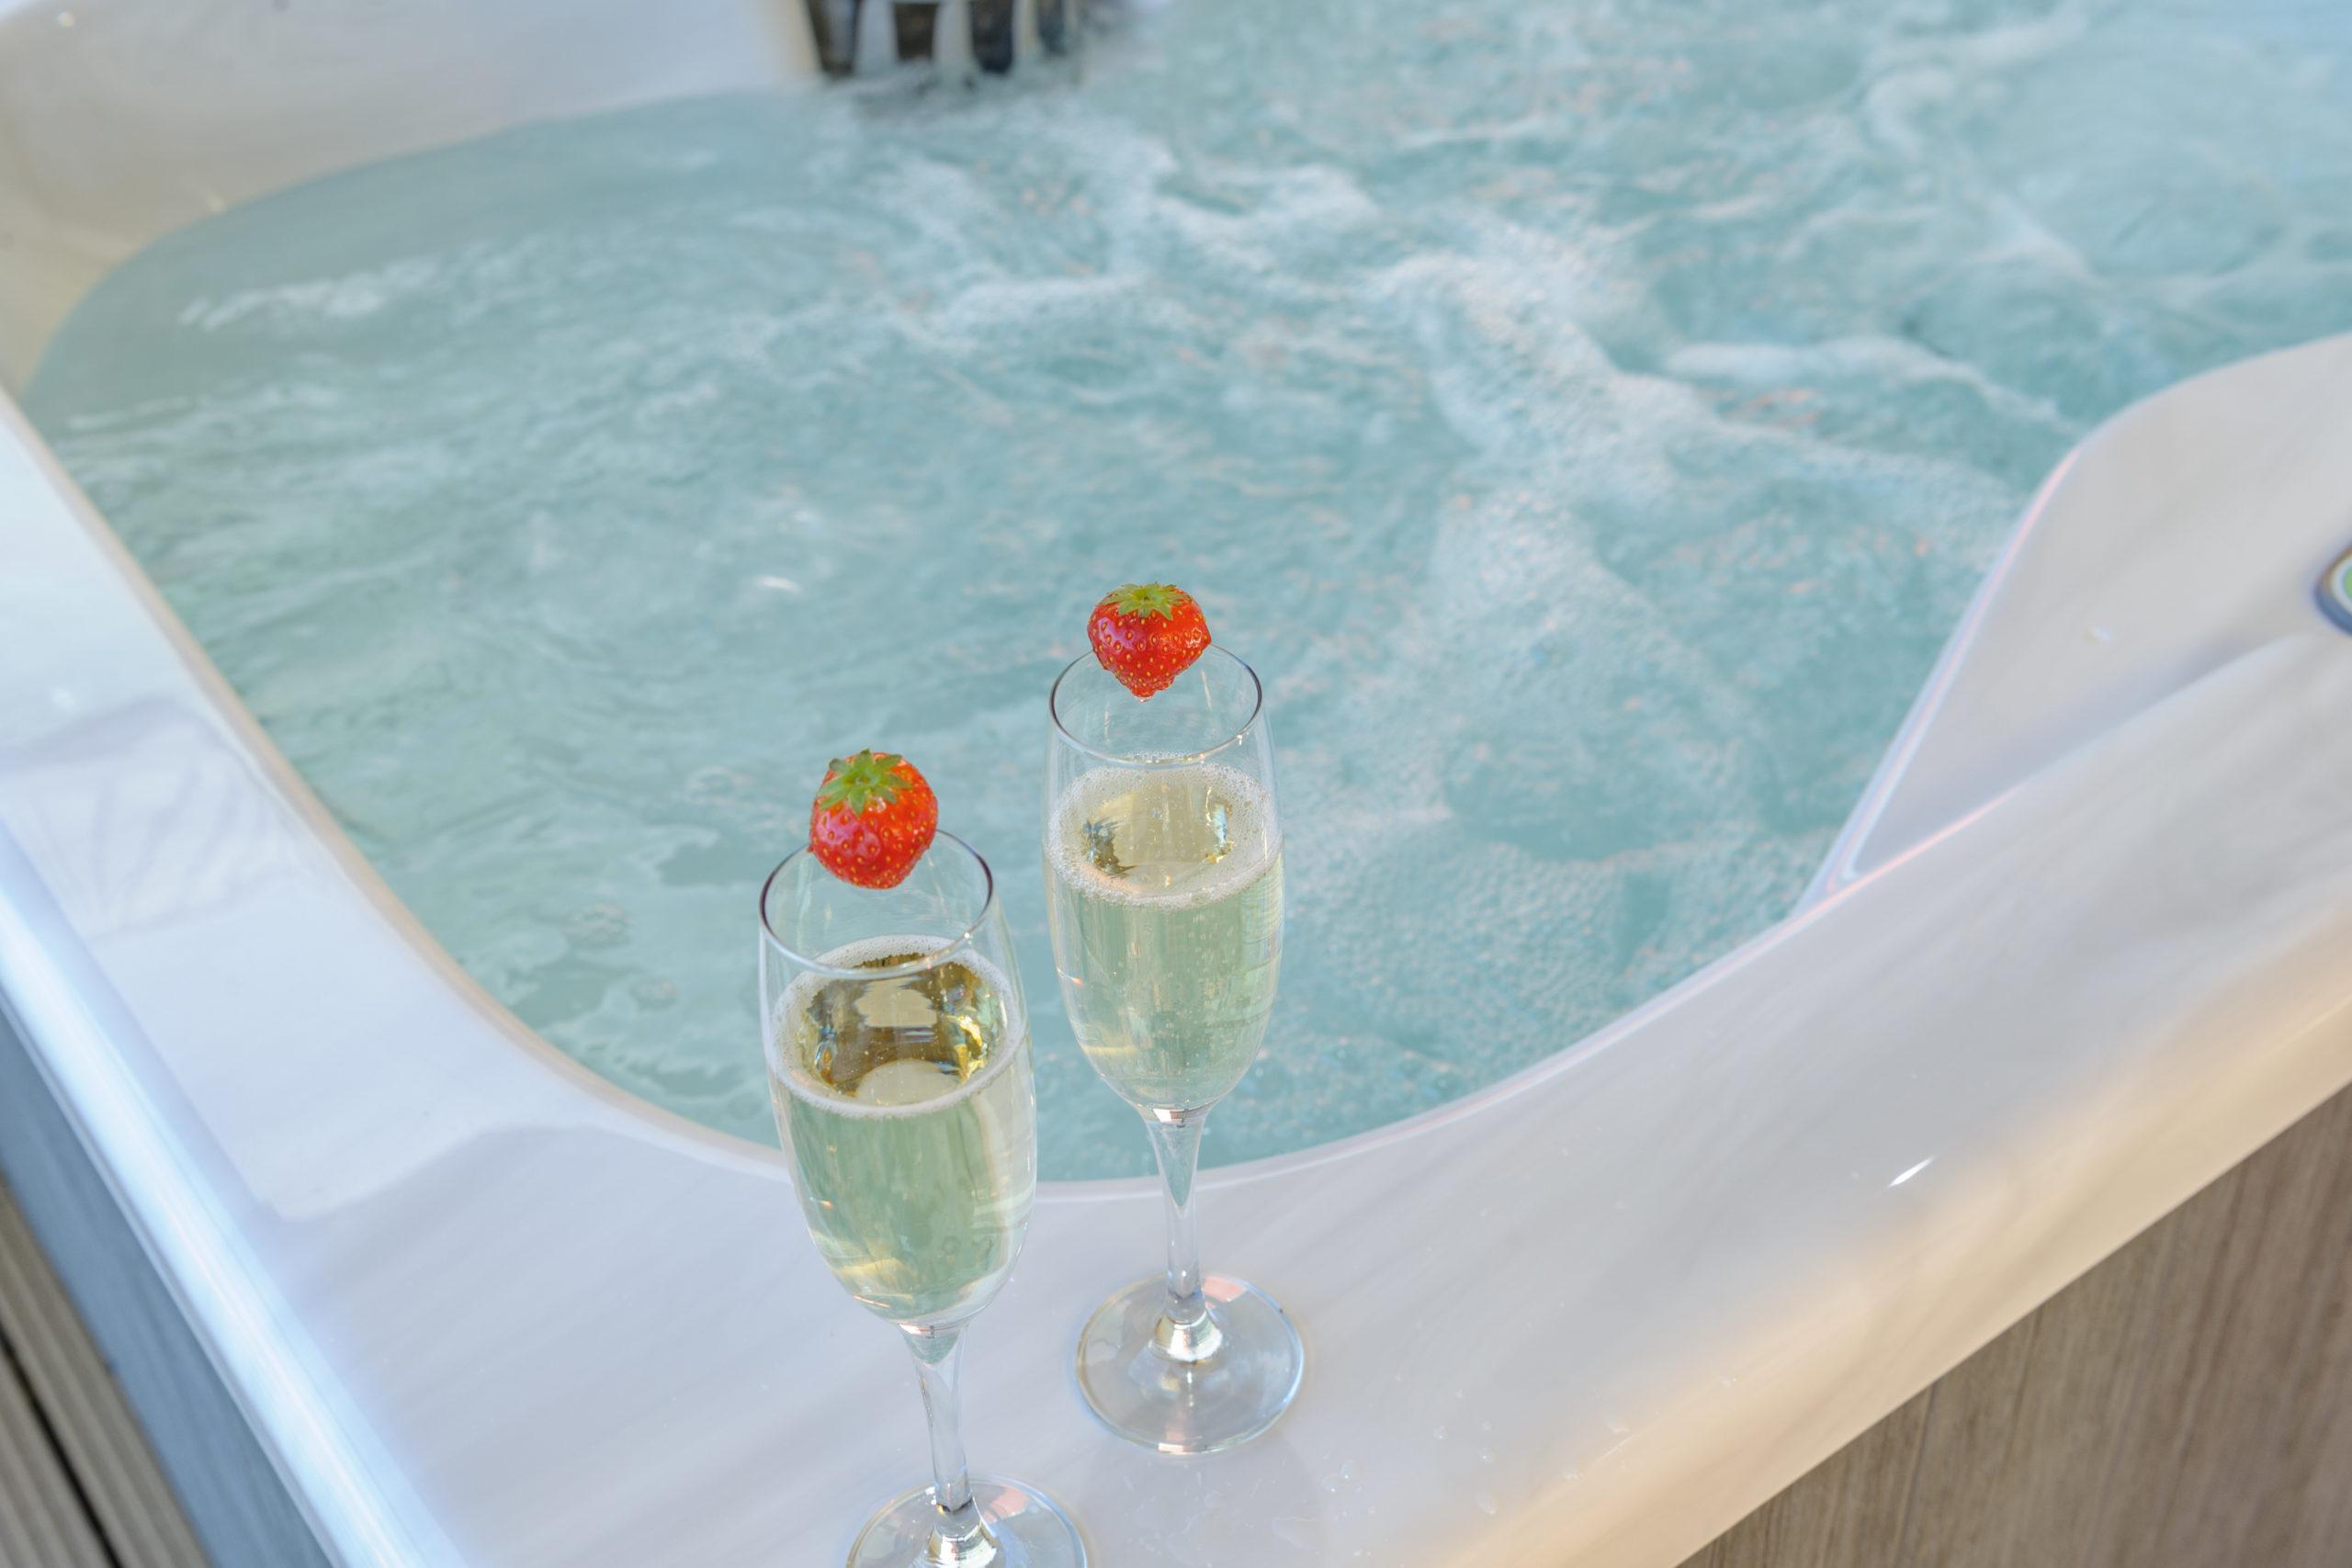 Quay West Hot tub luxury holiday apartment coble quay amble